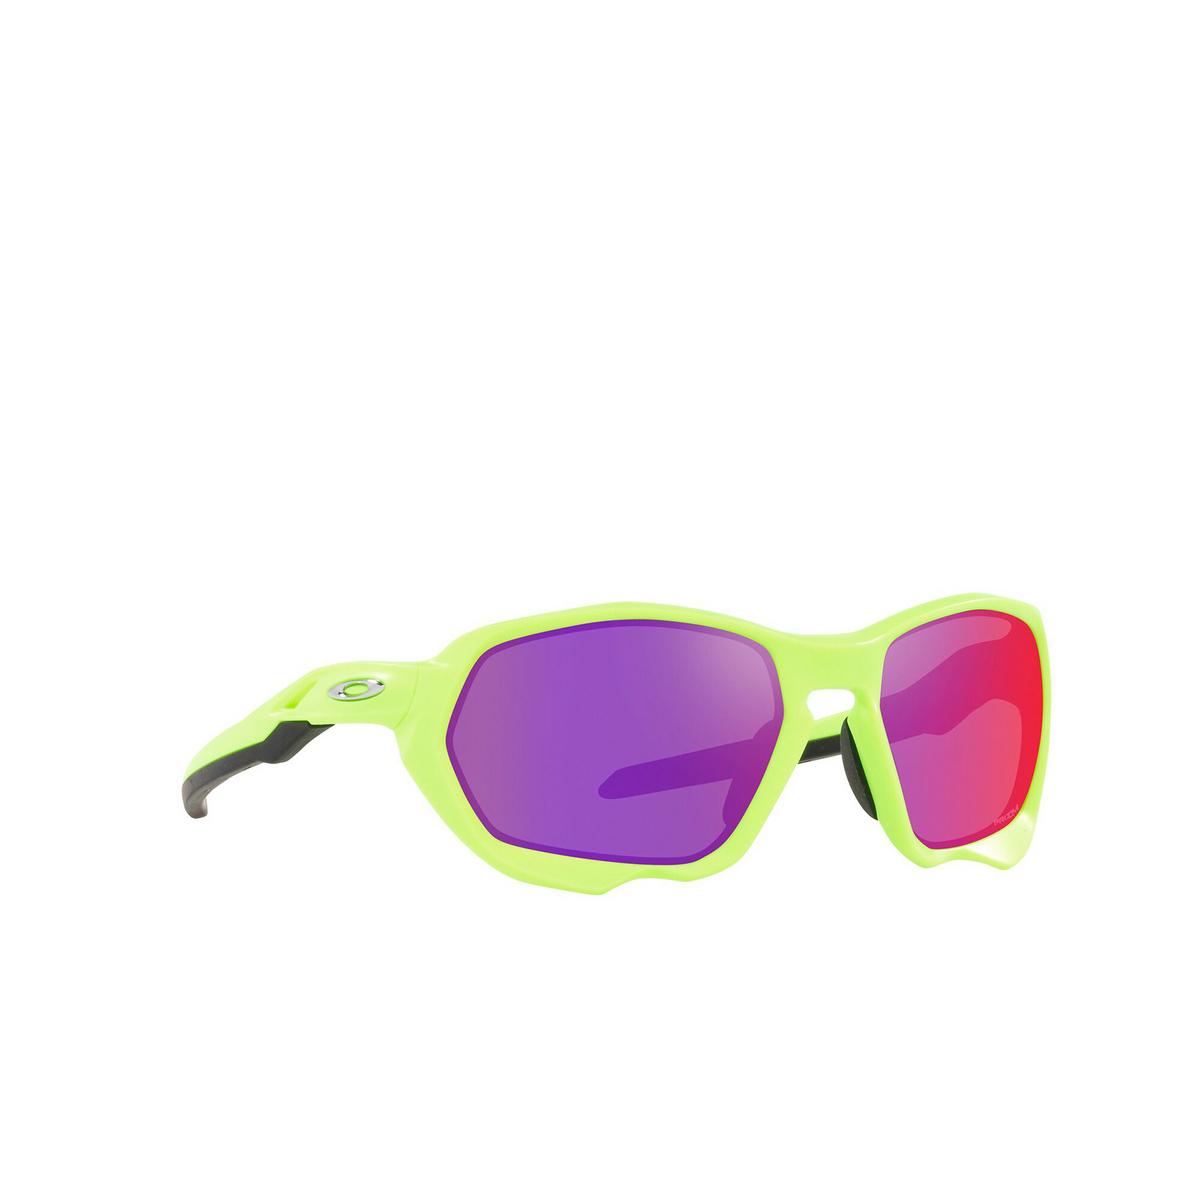 Oakley® Sport Sunglasses: Plazma OO9019 color Matte Retina Burn 901904 - three-quarters view.